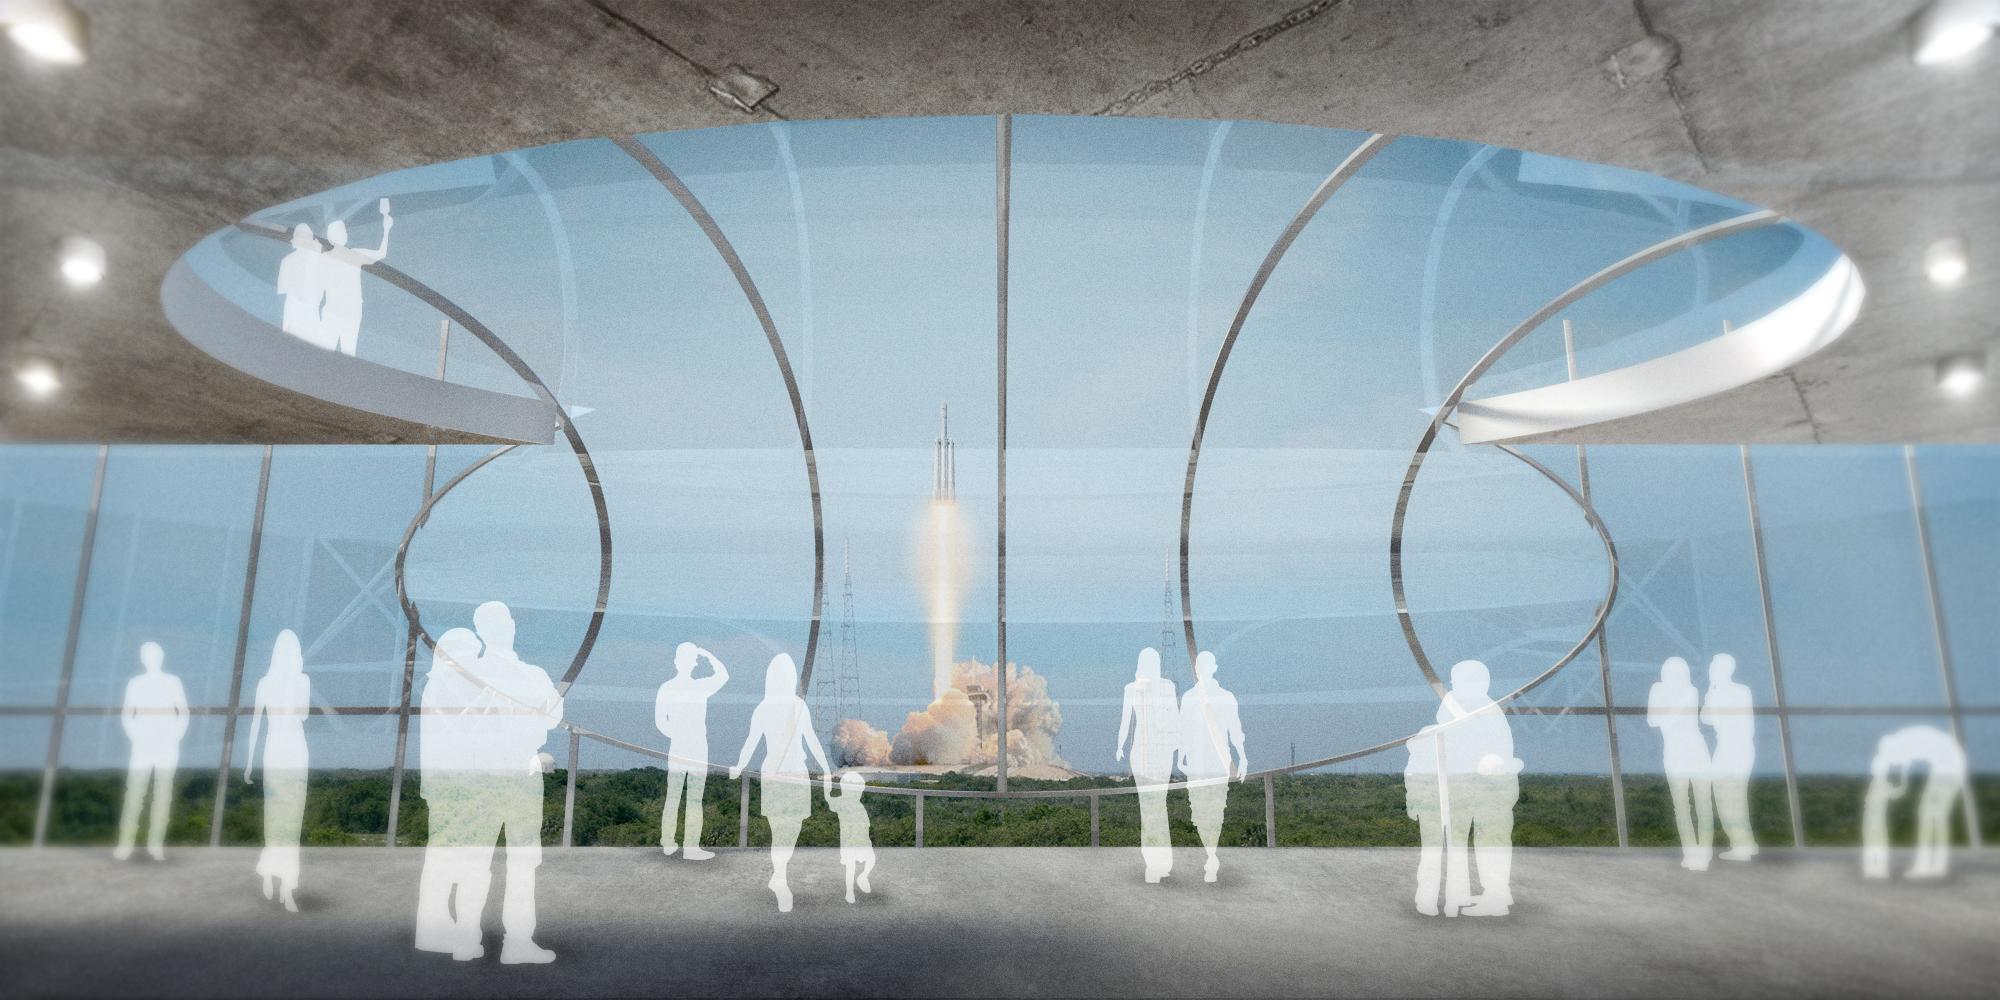 S.E.A.-Studio-Environmental-Architecture-David-Hertz-FAIA-Launch-Facility-Cape-Canaveral-Florida-sustainable-regenerative-restorative-green-design-Spacex-rocket-spaceship-astronaut-cosmos-space-exploration-cosmic-interstellar-tower-cool-rendering-4.jpg